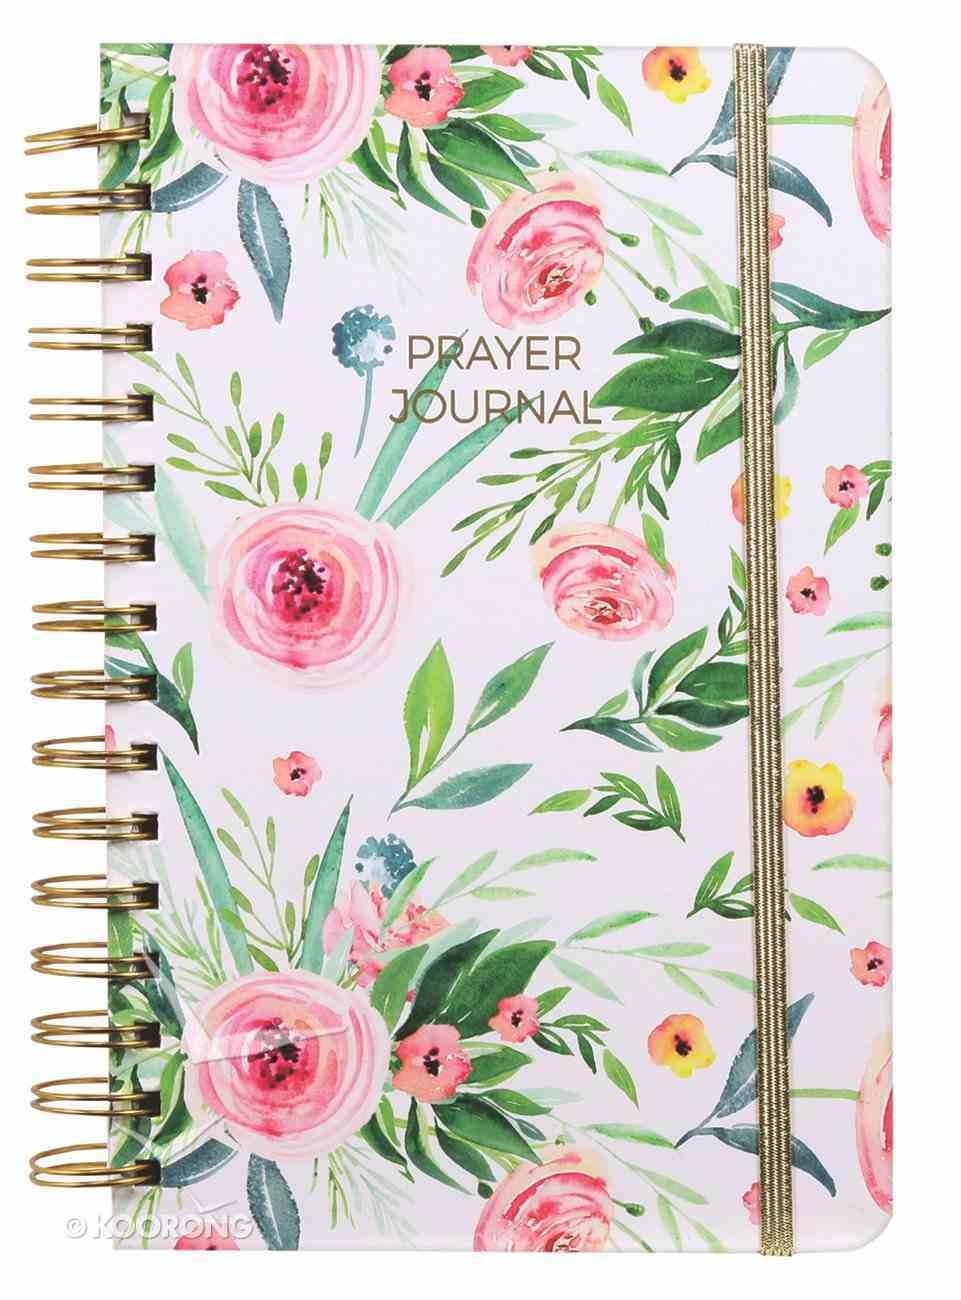 Prayer Journal: One Year Weekly Layout (Pink Floral) Spiral